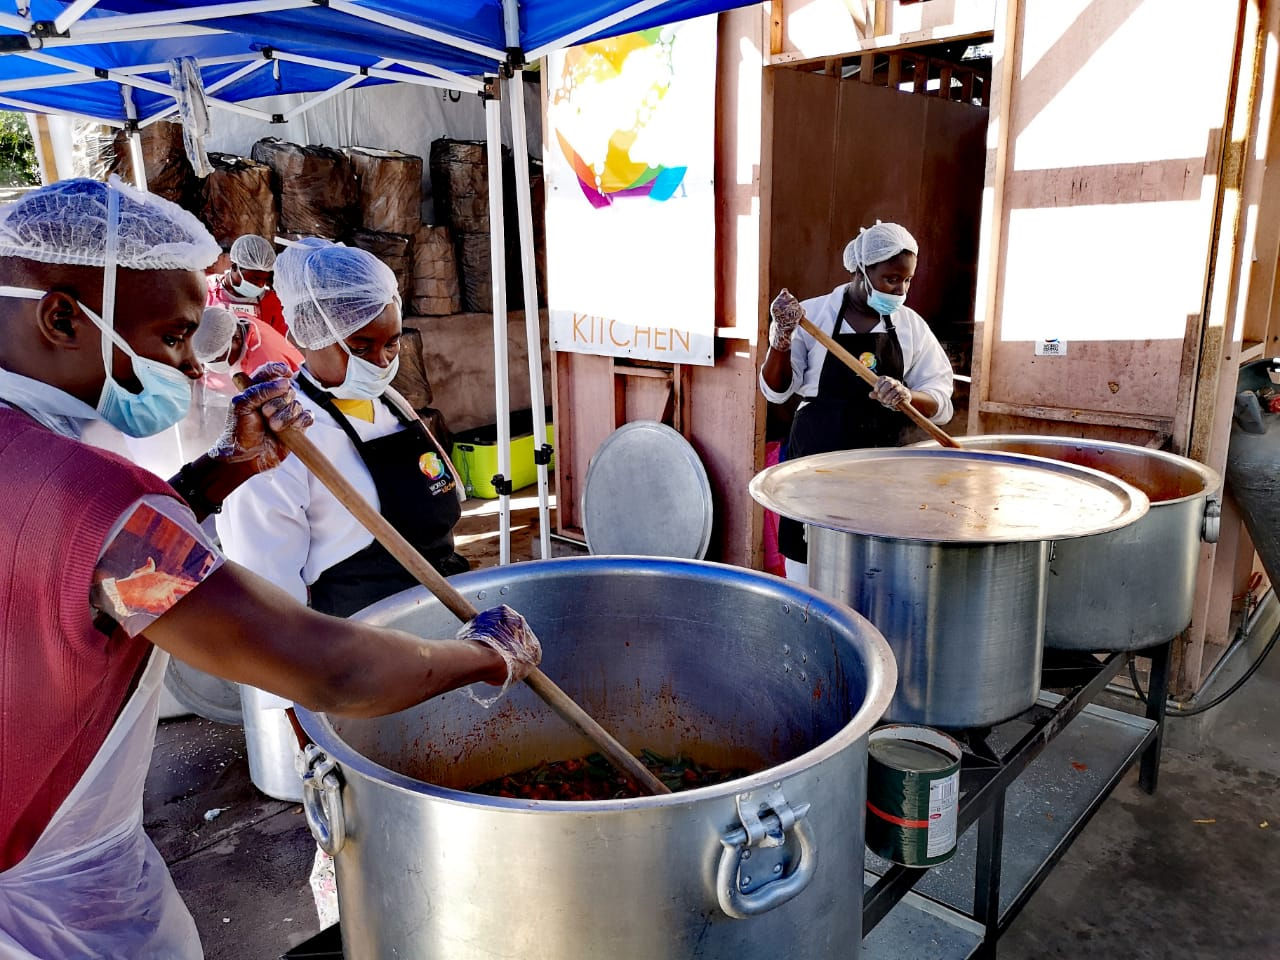 WCK's local team preparing meals for 2000 kids at the kitchen we built in Mezimbite.